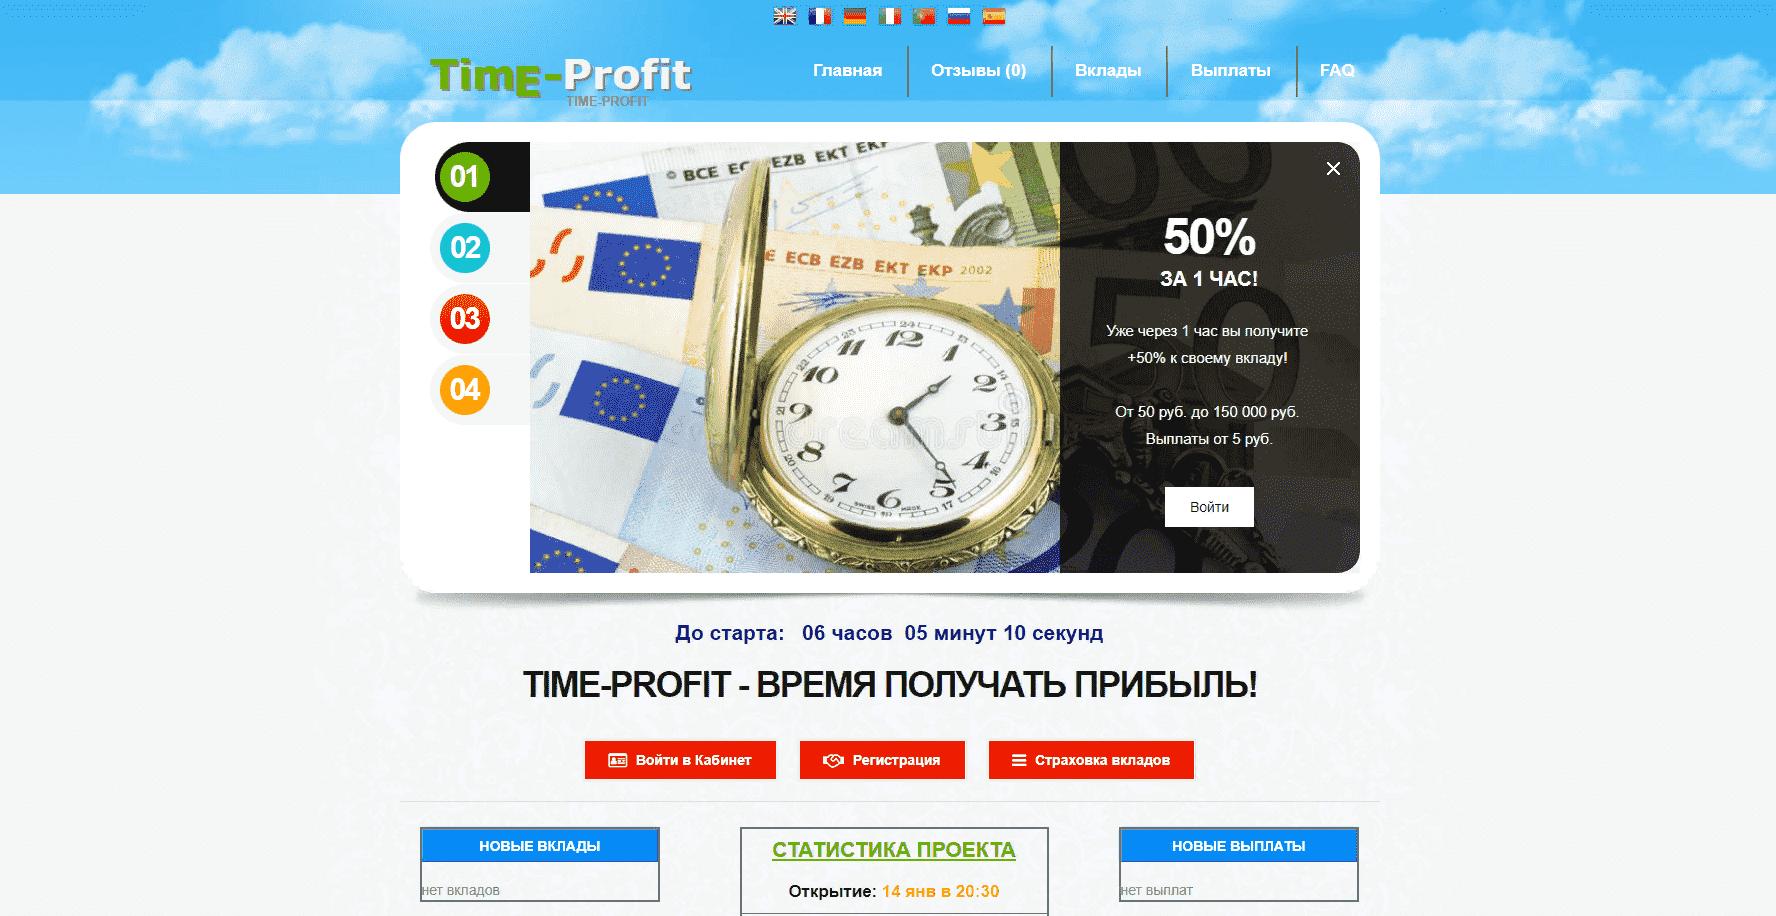 TIME-PROFIT